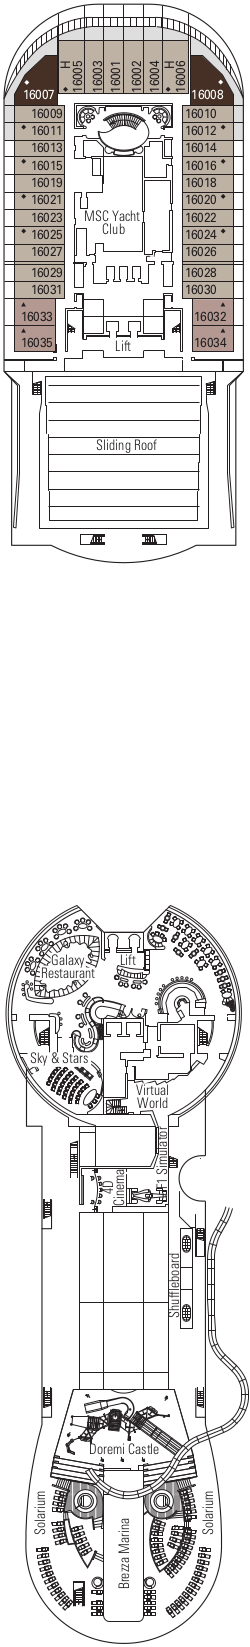 Msc Preziosa Ac Qu Amarina Deck Plan